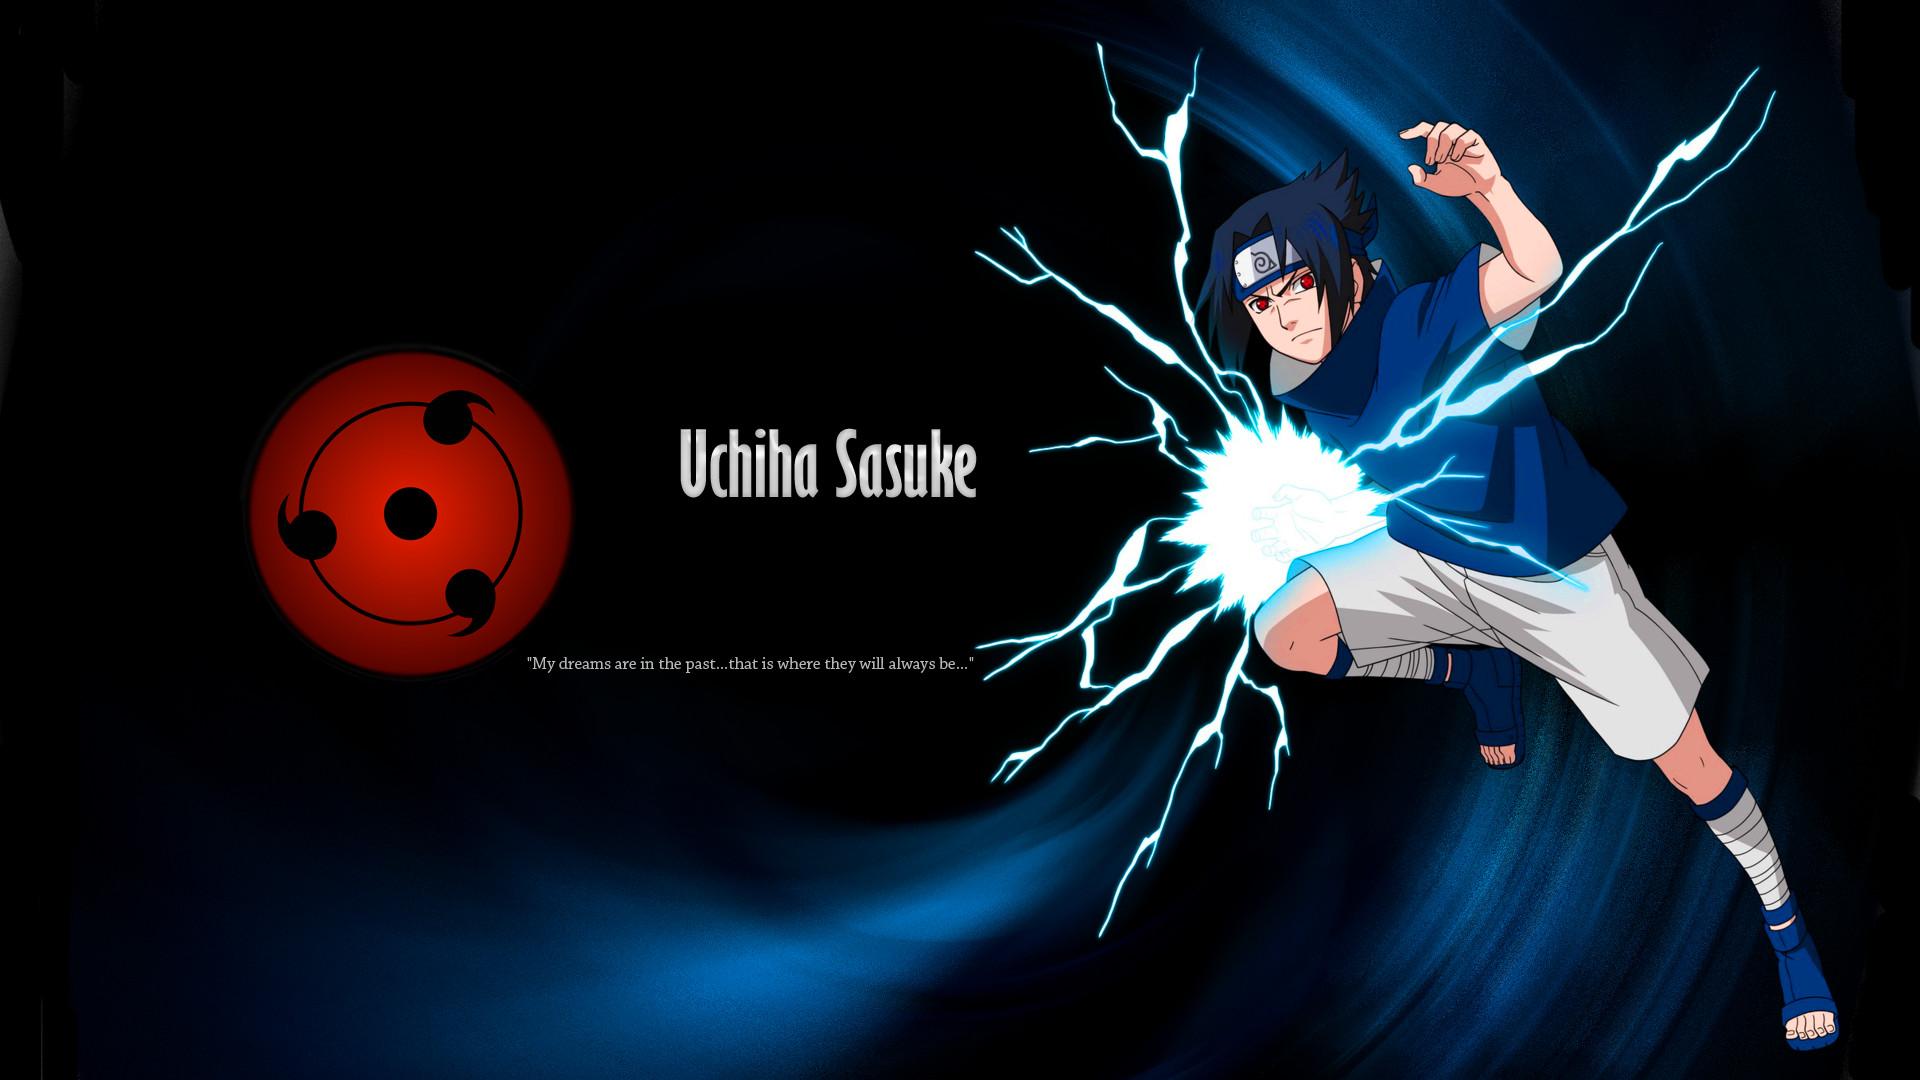 2010/287/3/8/uchiha_sasuke_hd_wallpaper_ps3_by_hugomoreira-d30rbw9.png .